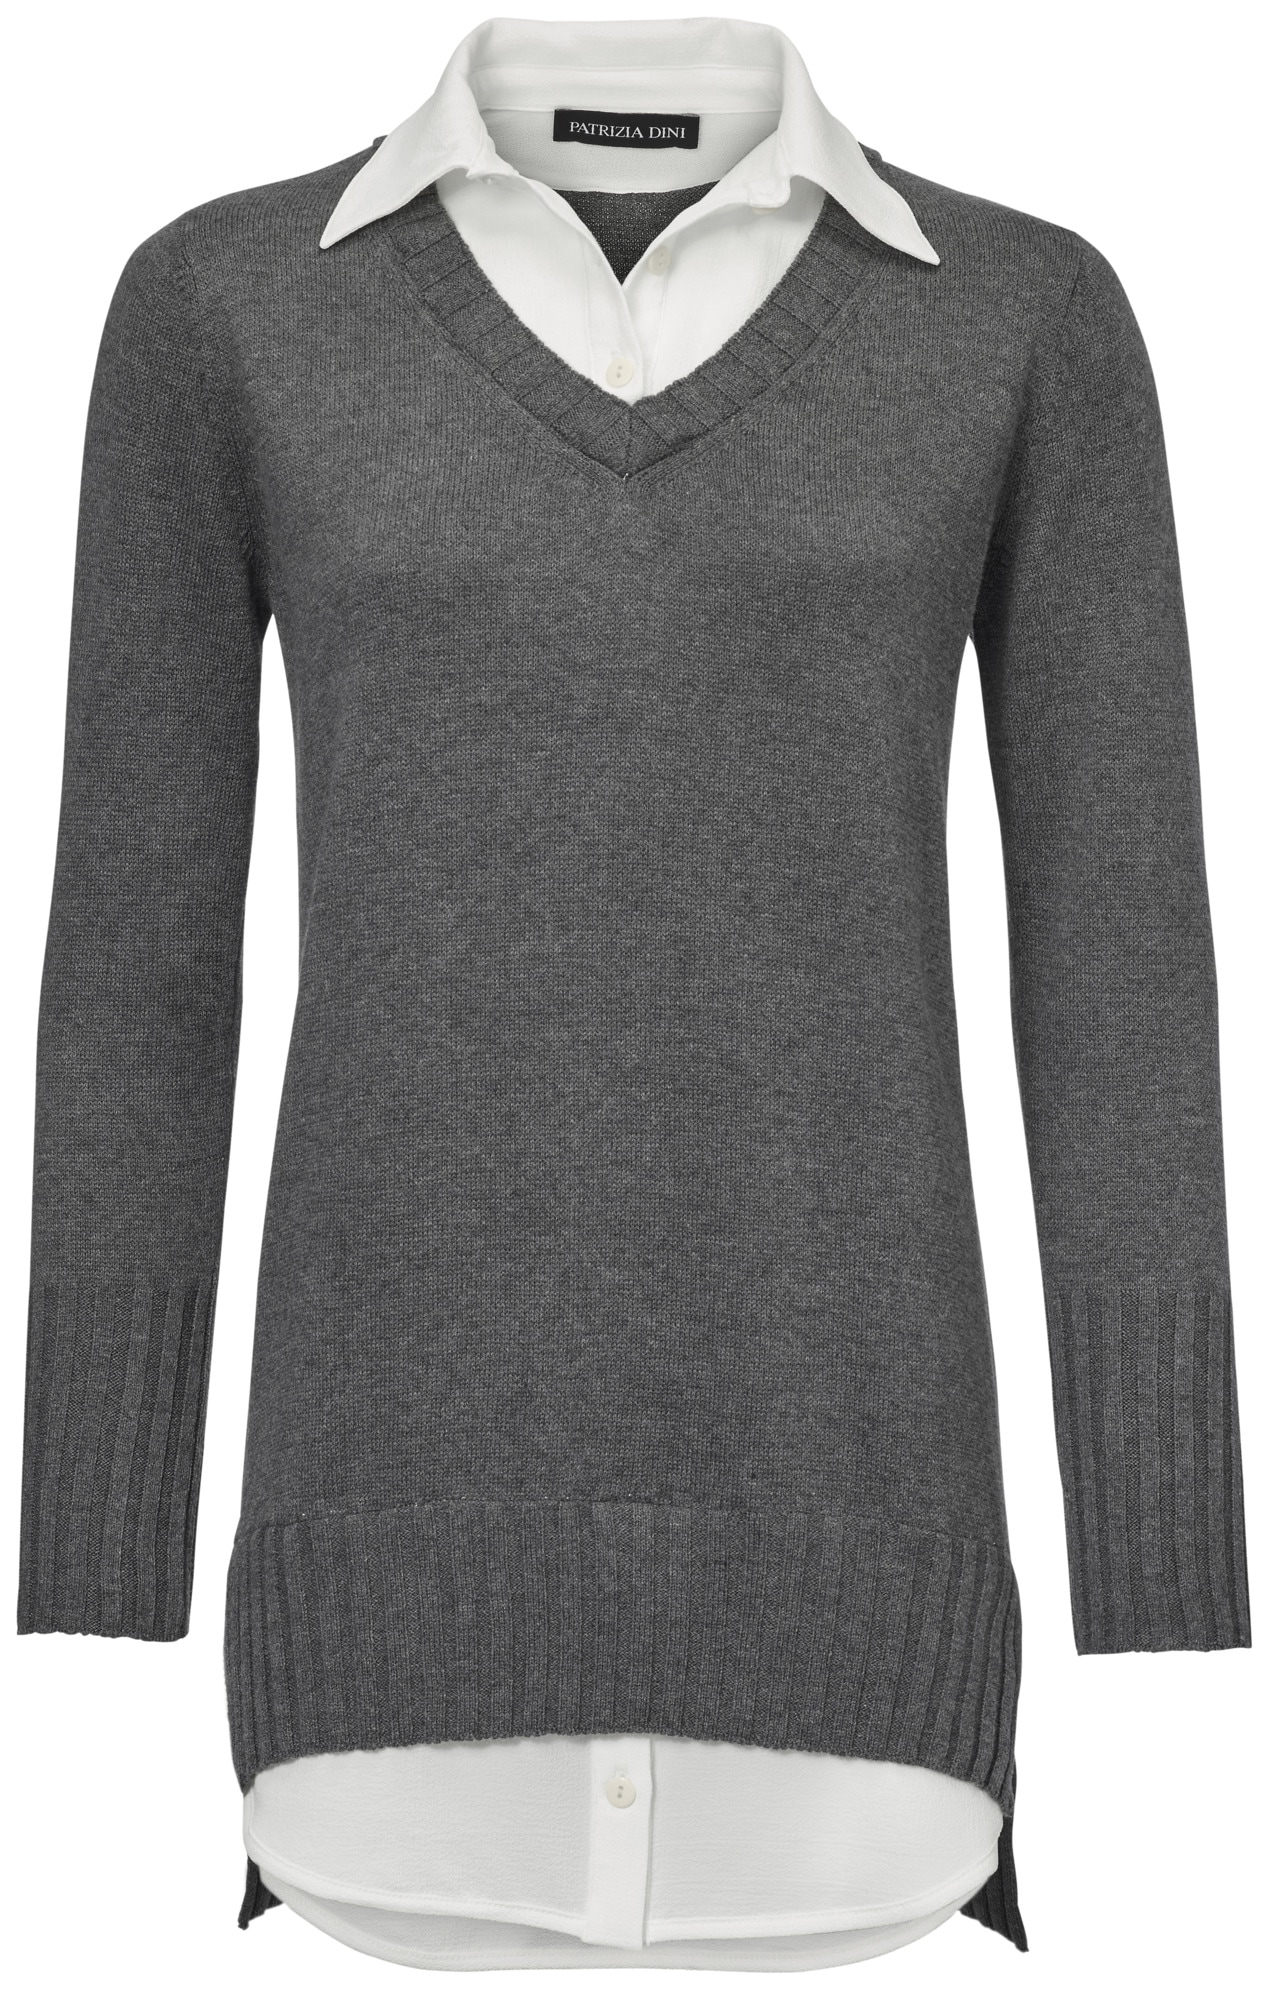 heine TIMELESS Longpullover mit Bluseneinsatz | Bekleidung > Pullover > Longpullover | Grau | Polyester | Heine Timeless